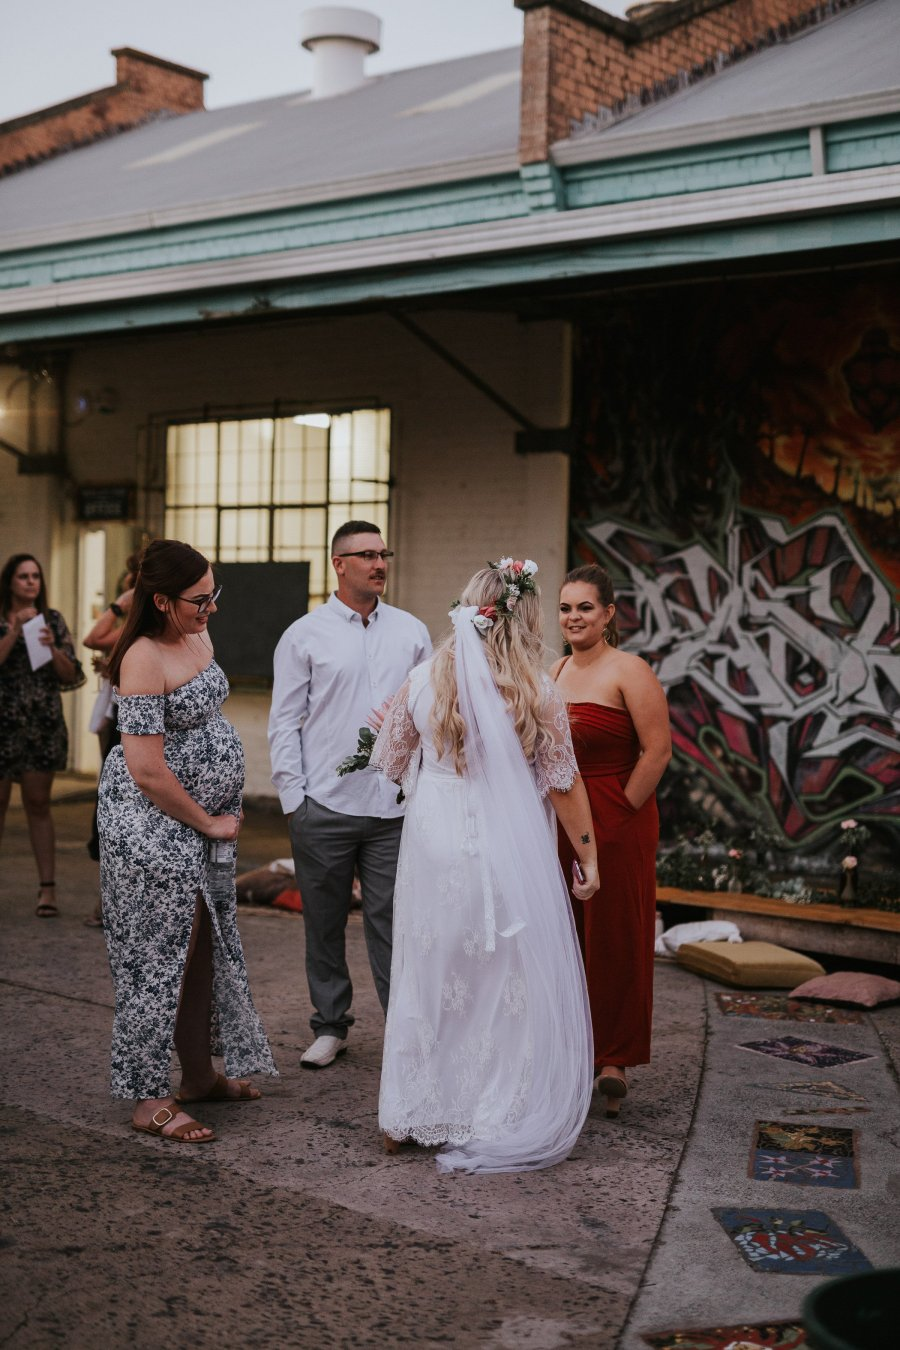 Ebony Blush Photography   Perth wedding Photographer   Perth City Farm Wedding   Imogen + Tristian154